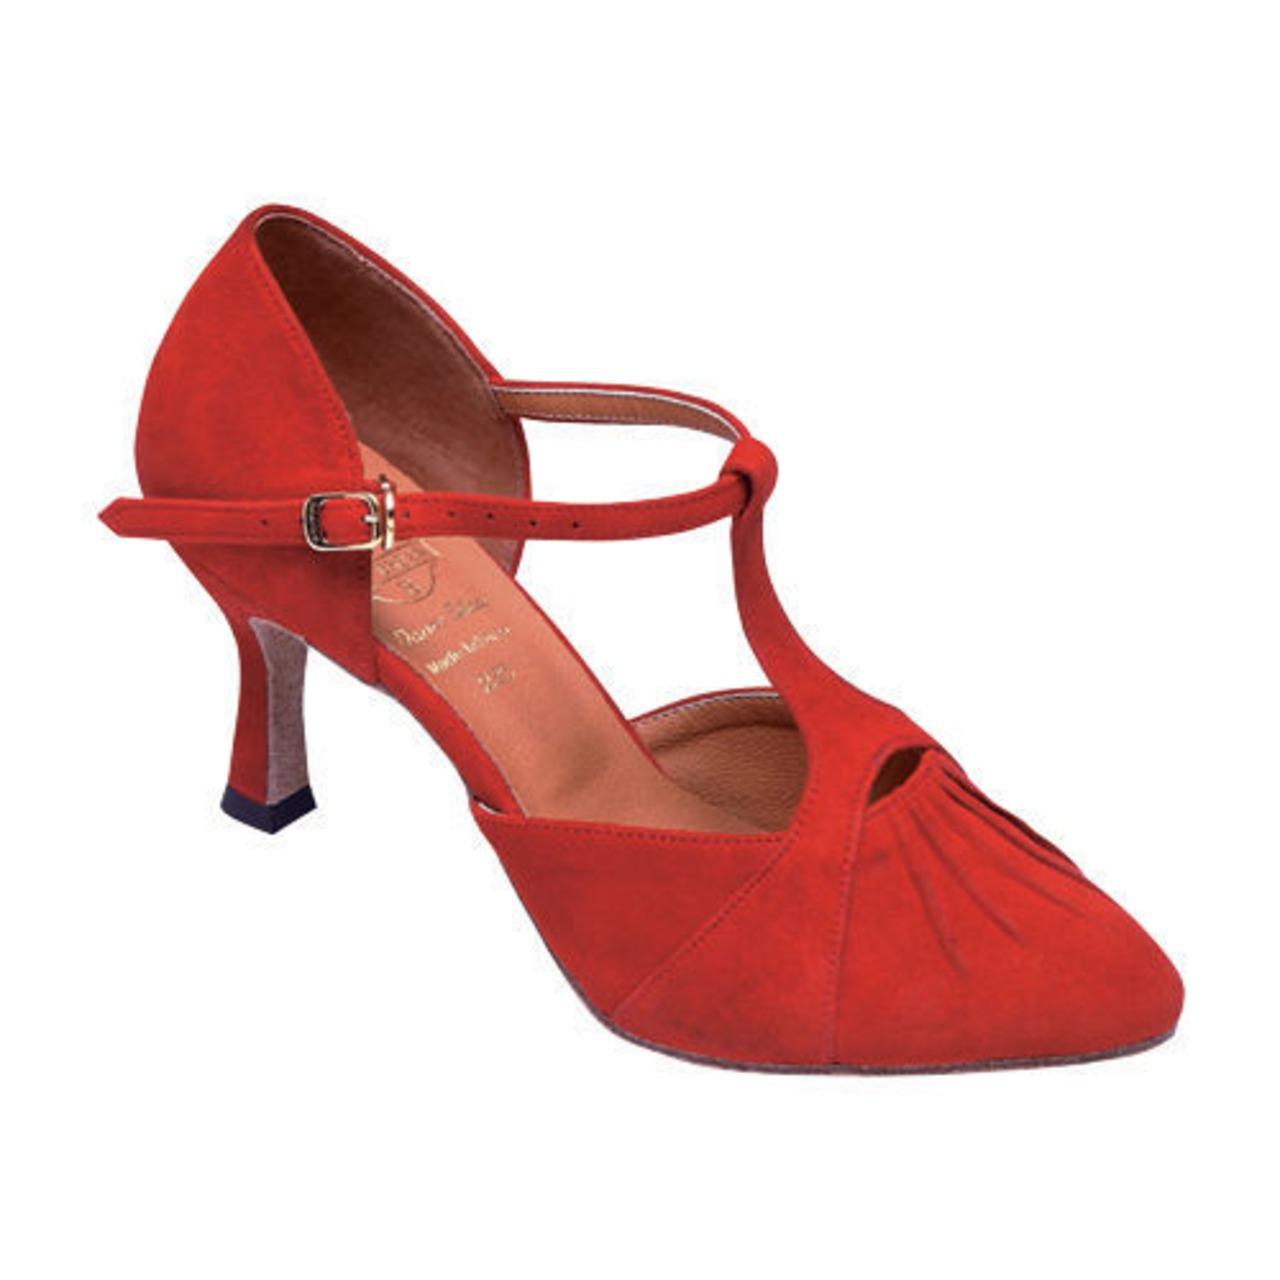 3010 (RED NUBUCK)